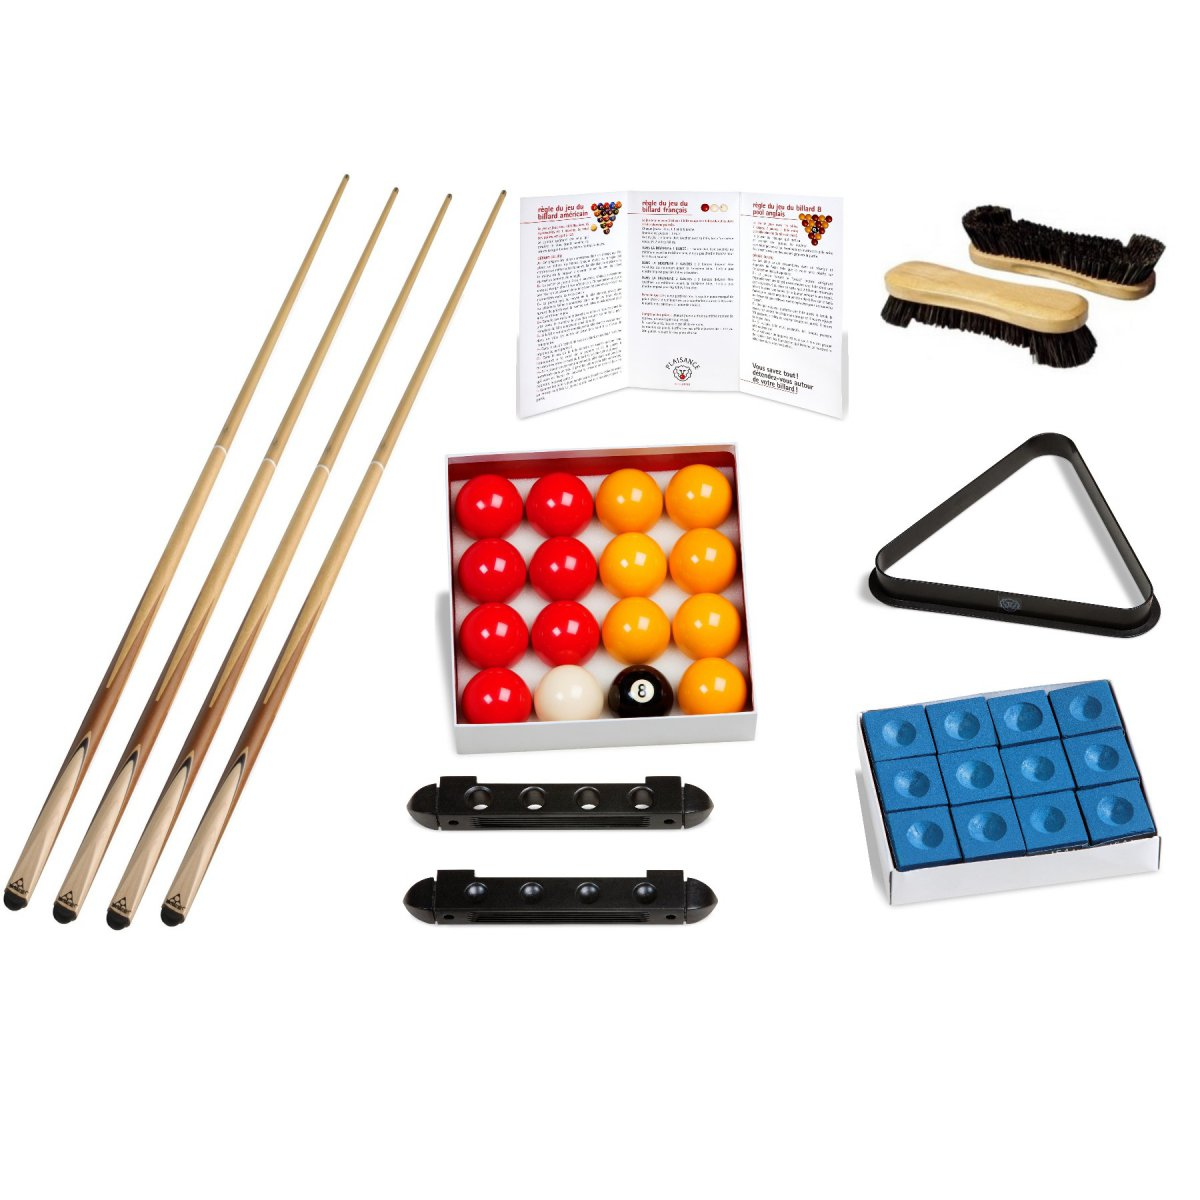 kit accessoires billard queues billes triangle craies brosse porte queue. Black Bedroom Furniture Sets. Home Design Ideas